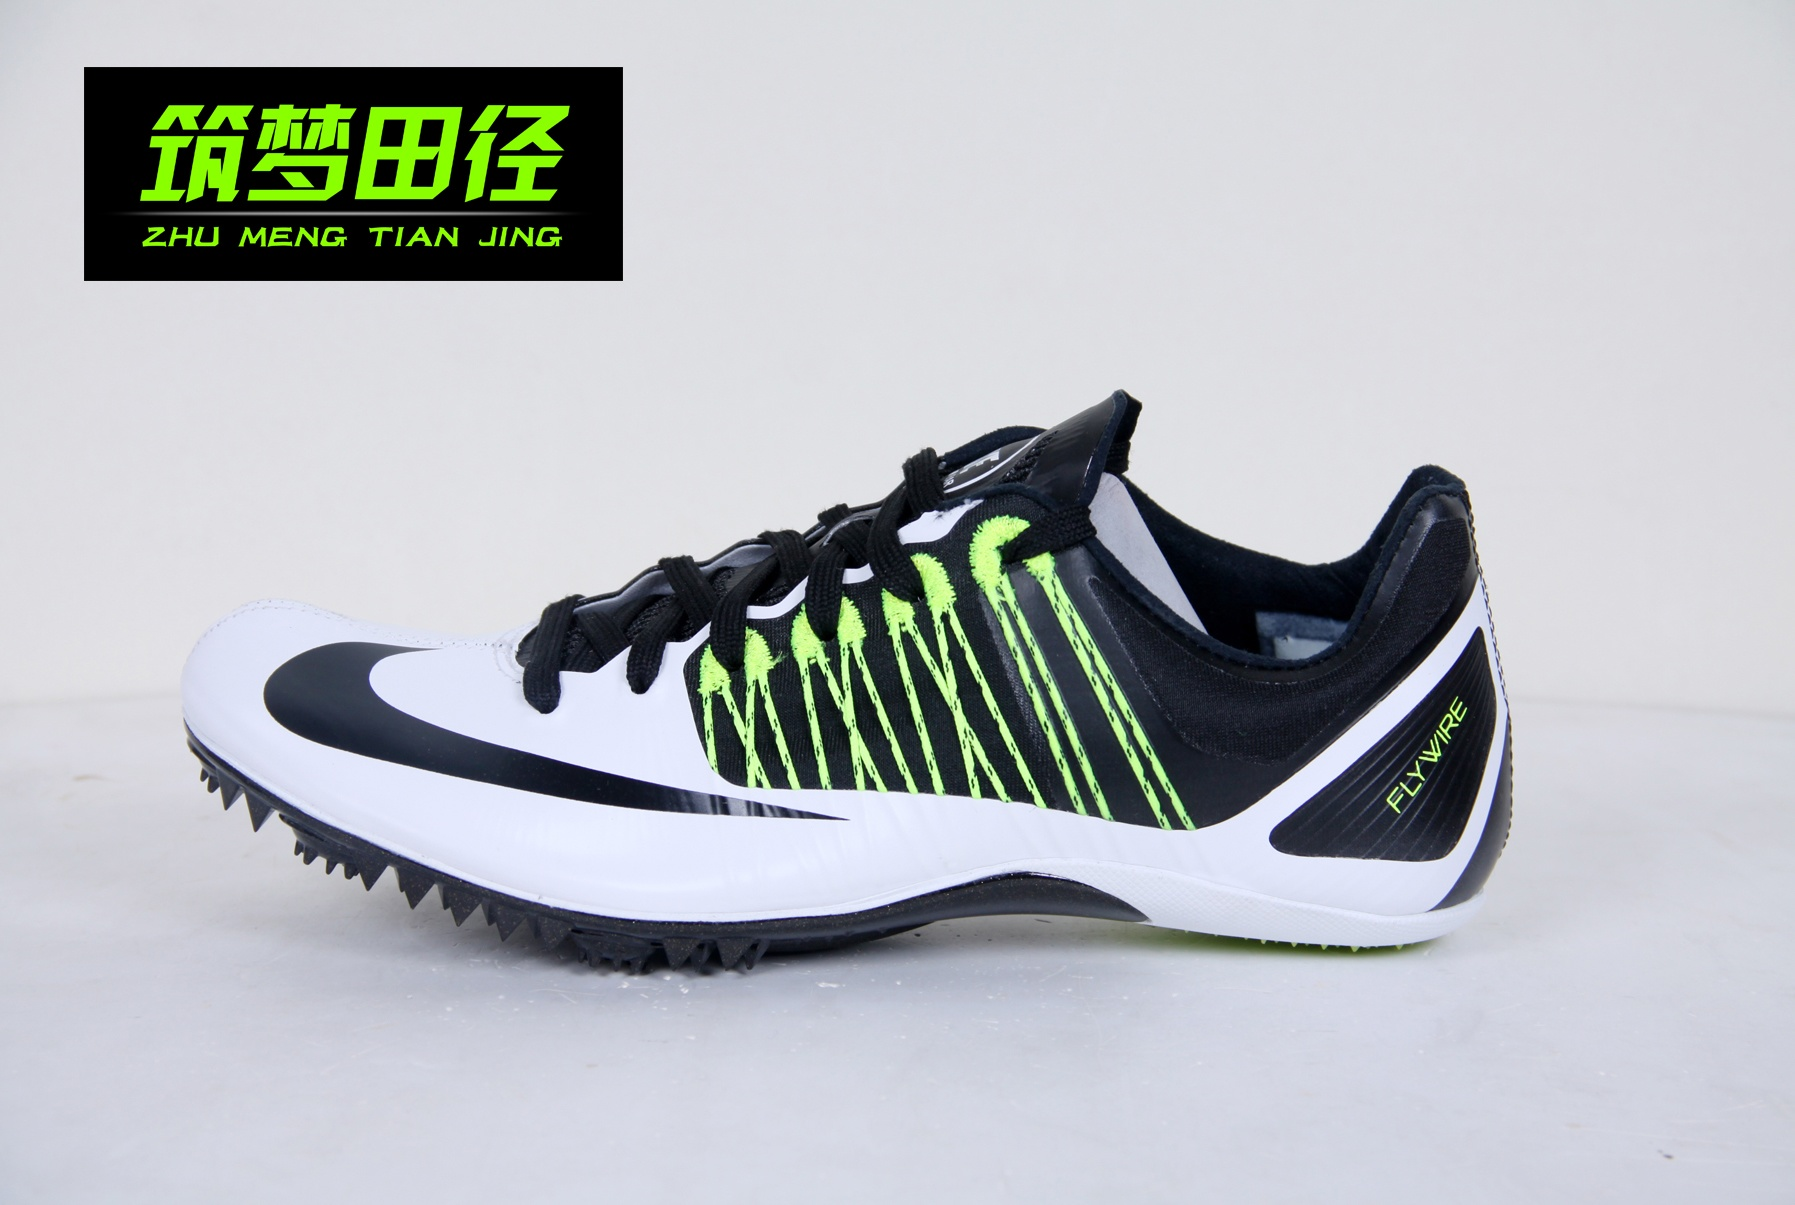 Кроссовки Nike 15 Zoom Celar5 кроссовки nike tokicc 599441 019